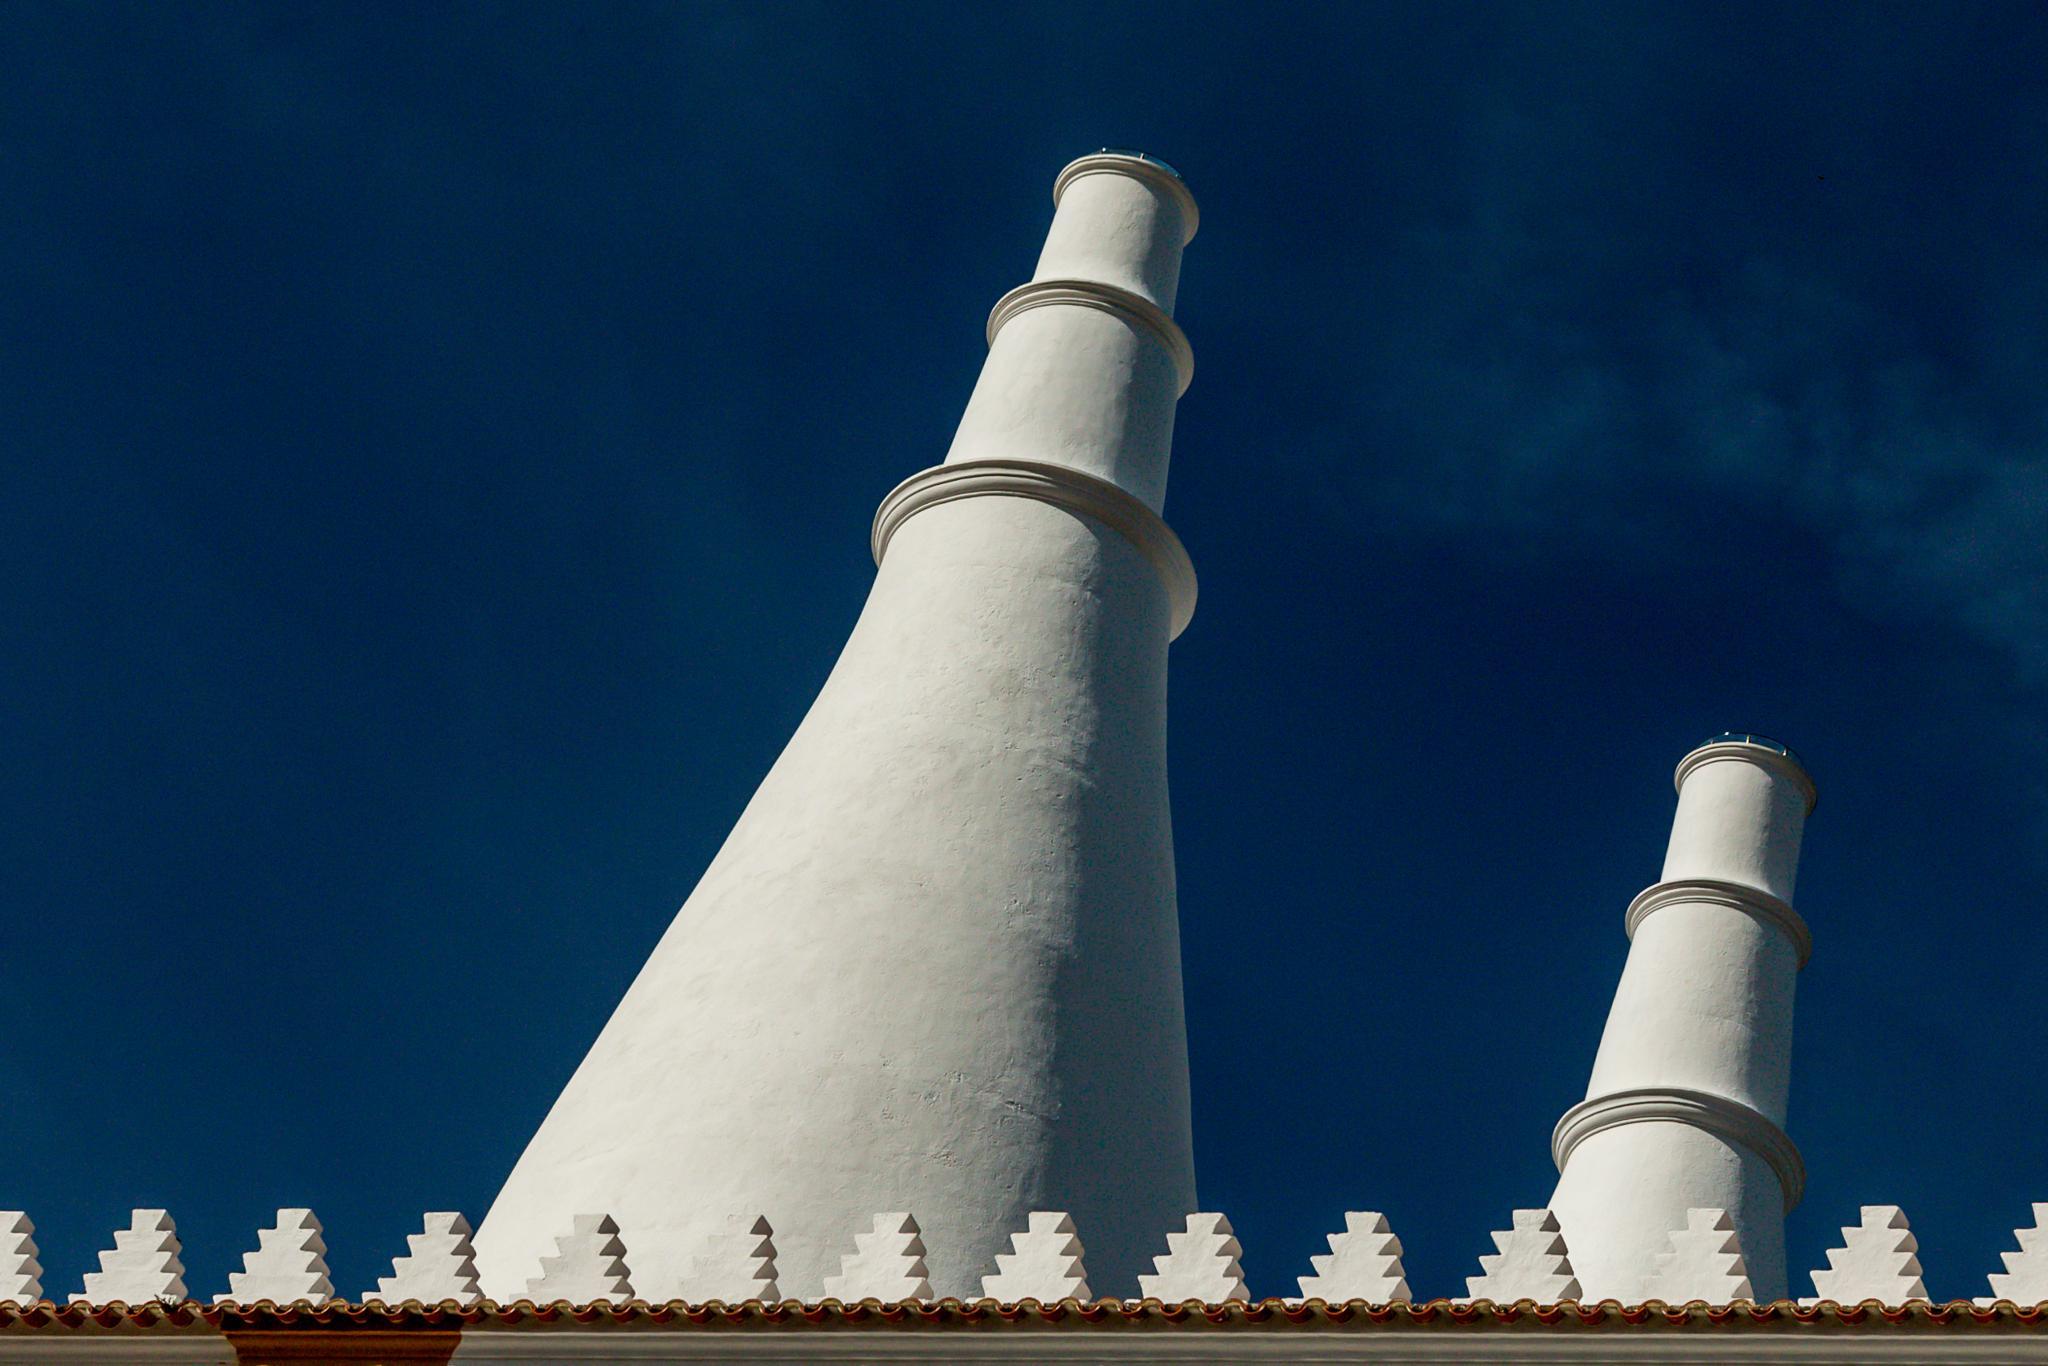 Chimneys of Sintra National Palace by stephenhops